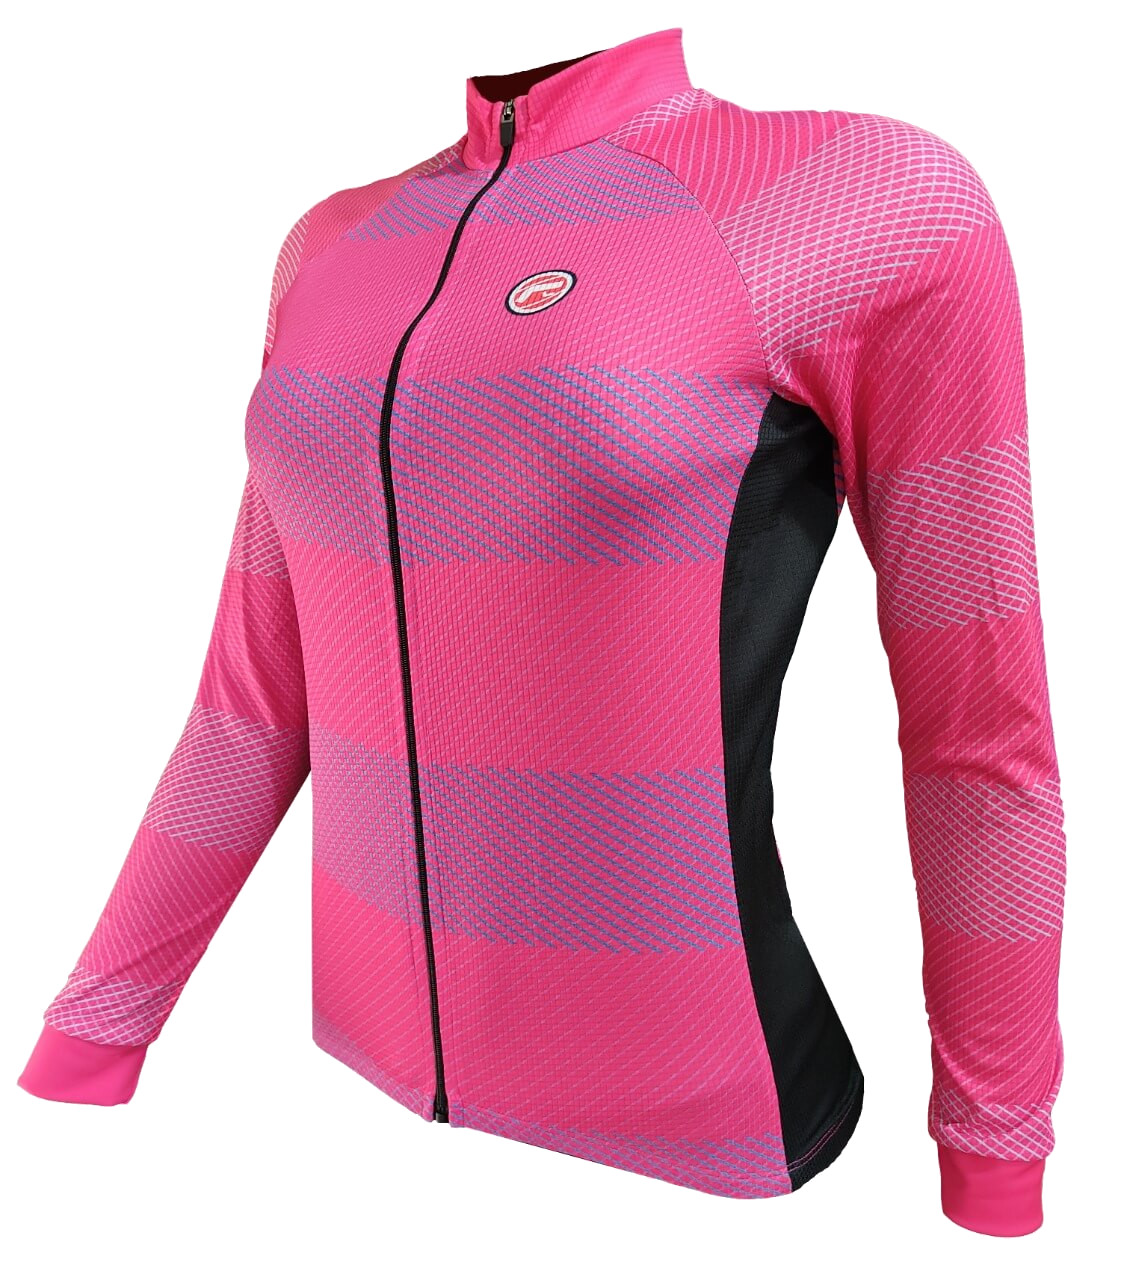 Camisa Ciclismo Barbedo Feminina Moselle Rosa